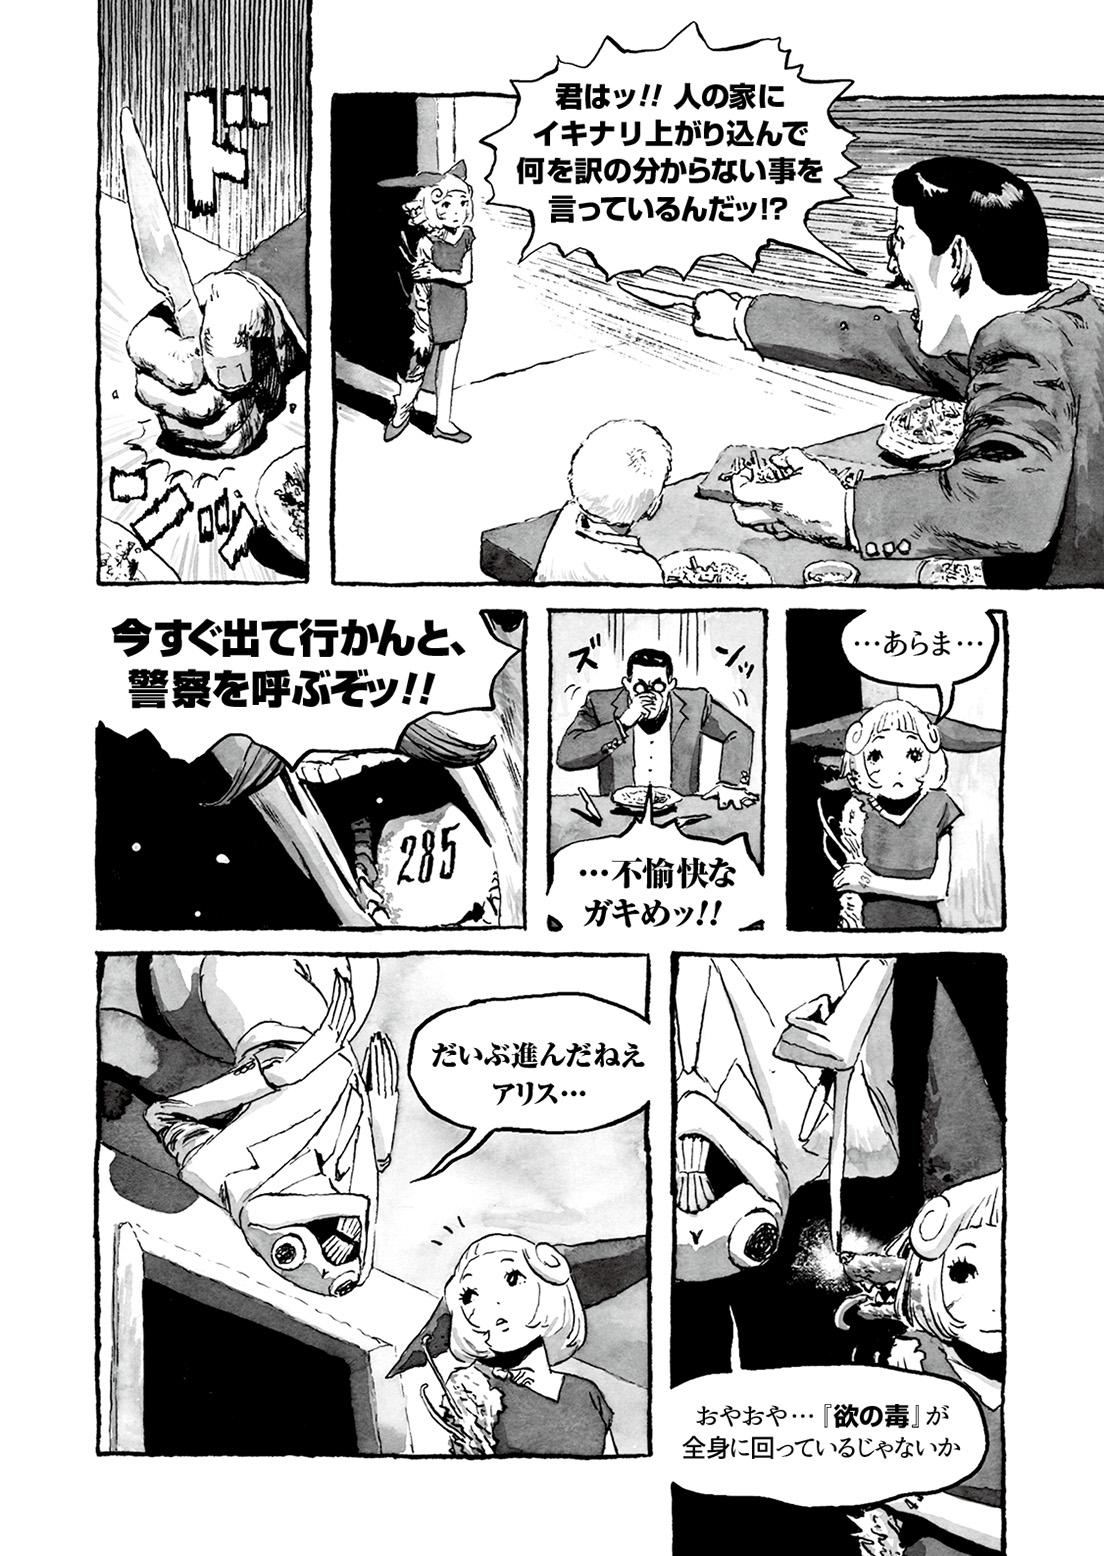 長編漫画「BIBLIOMANIA」連載 第4話「285号室の食卓」16P